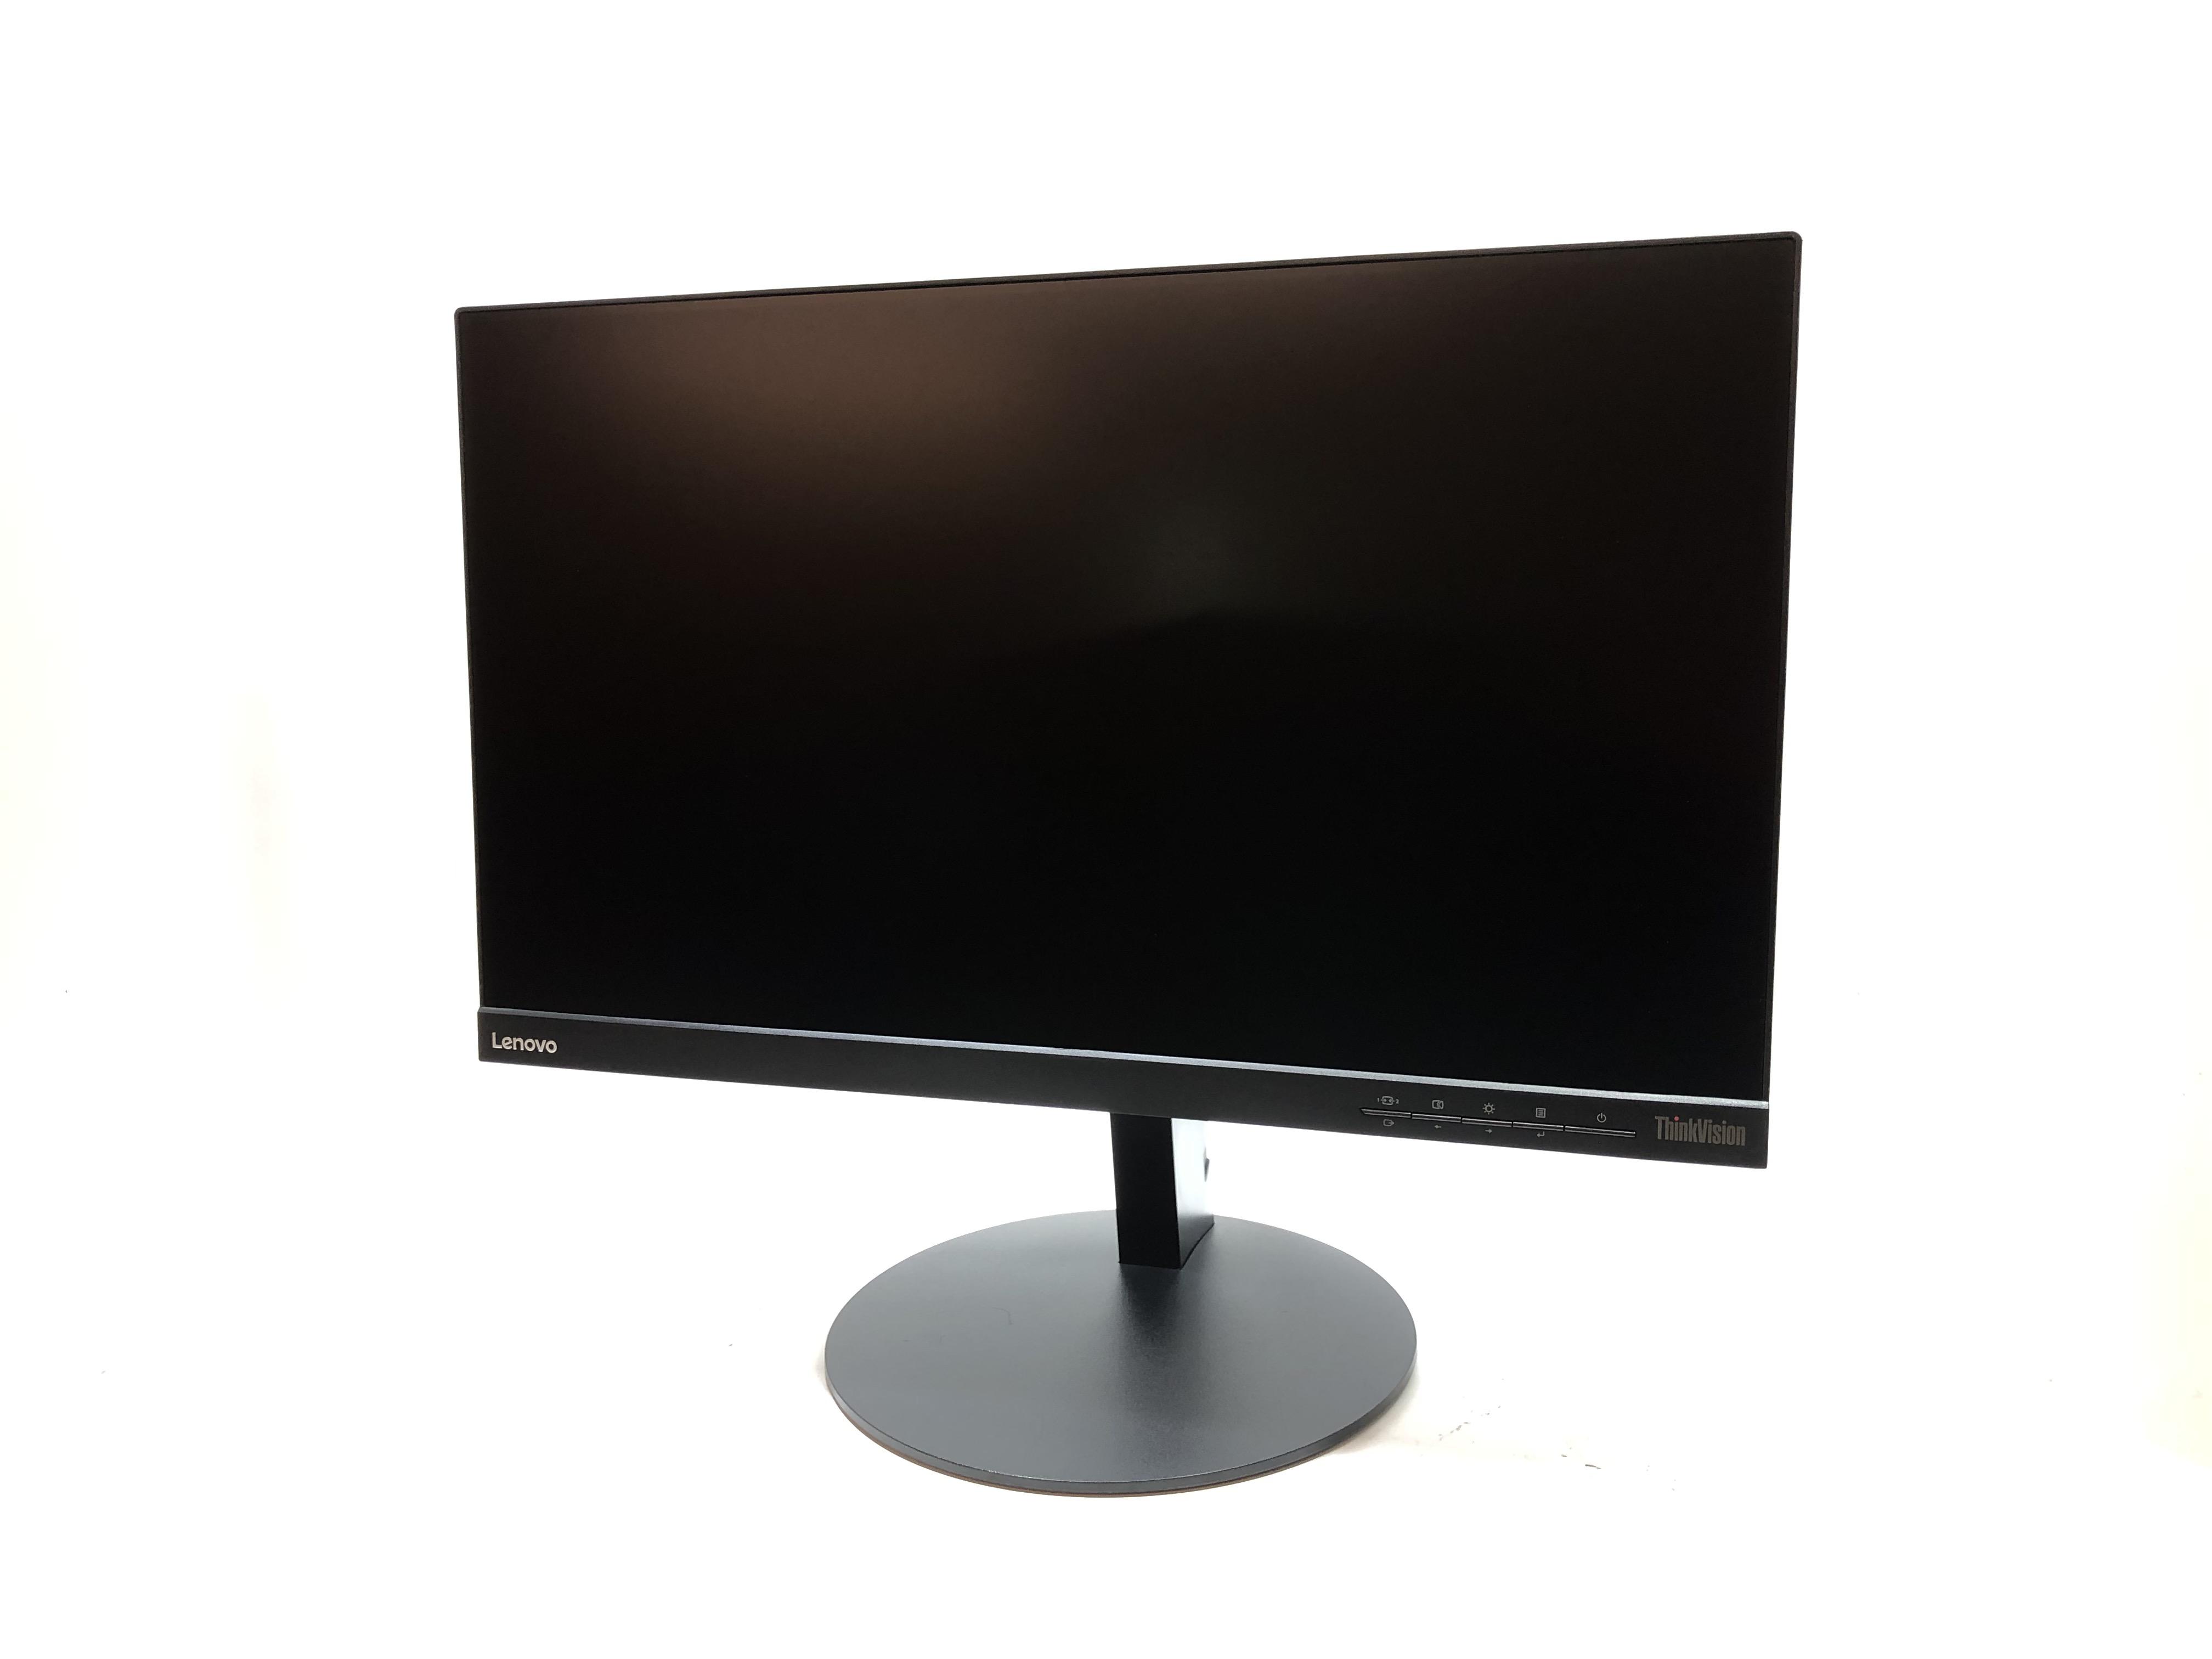 Lenovo-ThinkVision-T23i-10